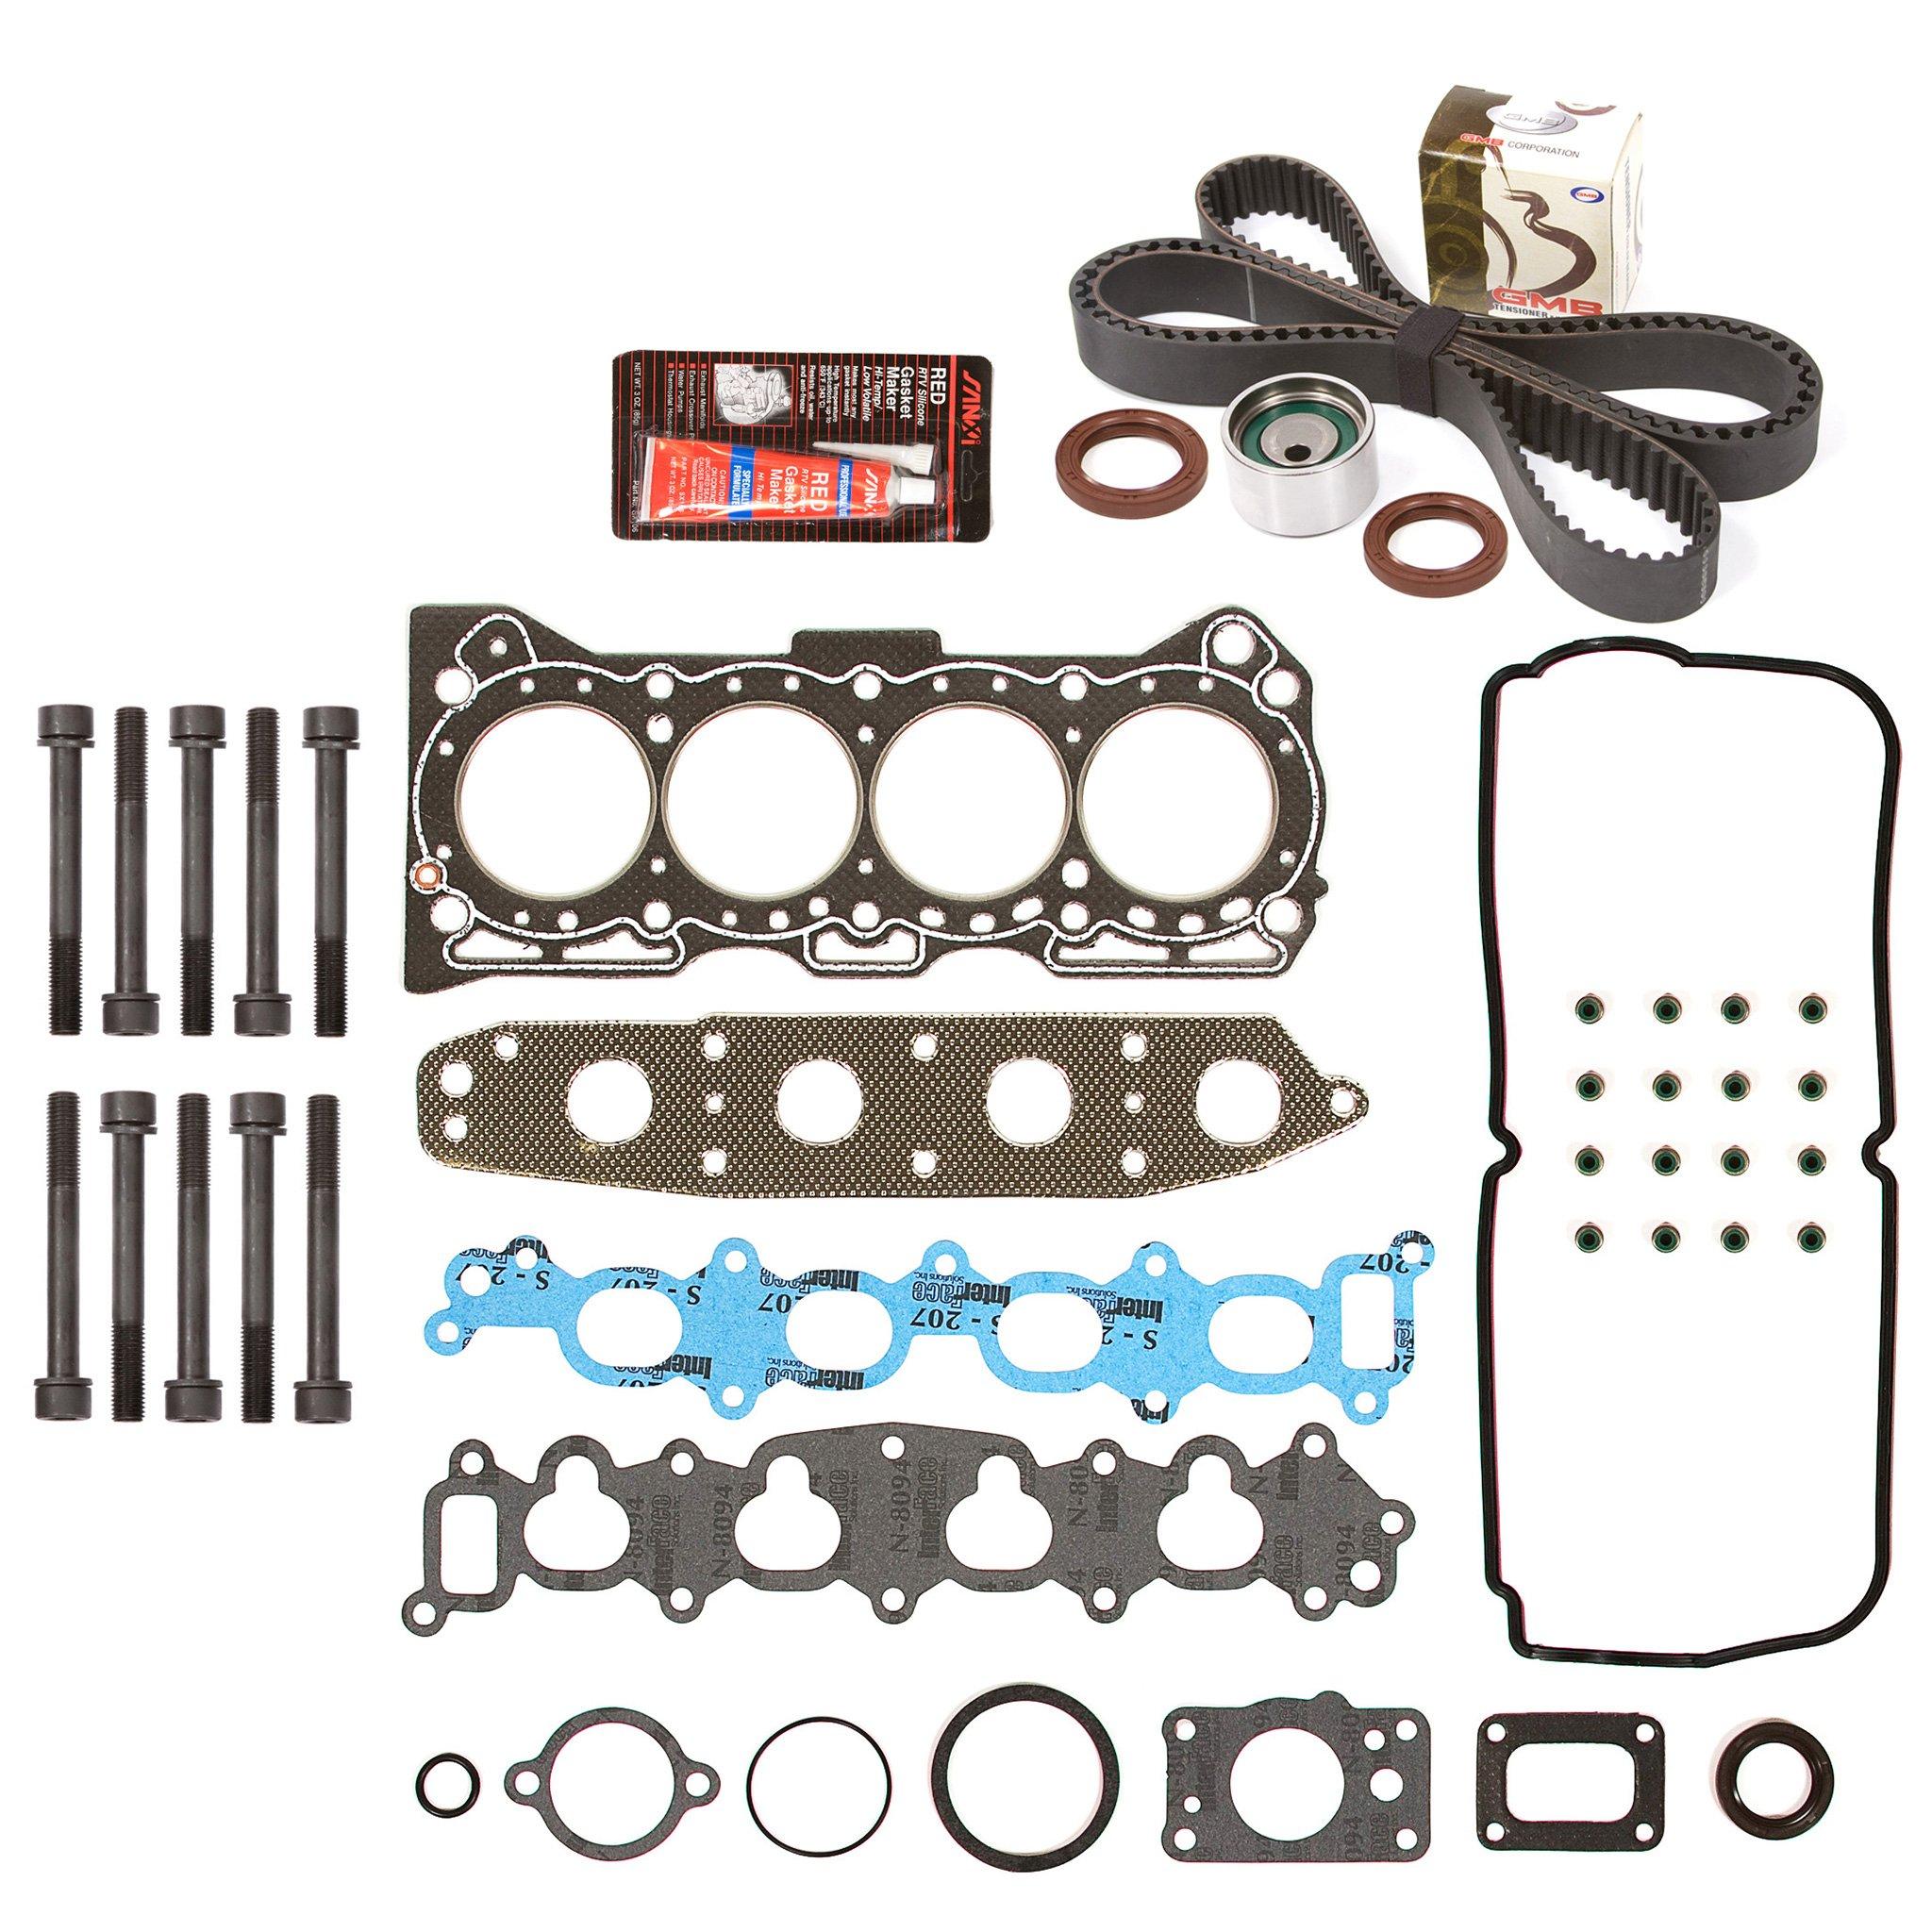 Evergreen HSHBTBK8008 Head Gasket Set Head Bolts Timing Belt Kit 92-01 Geo Suzuki Chevrolet 1.6 G16KV